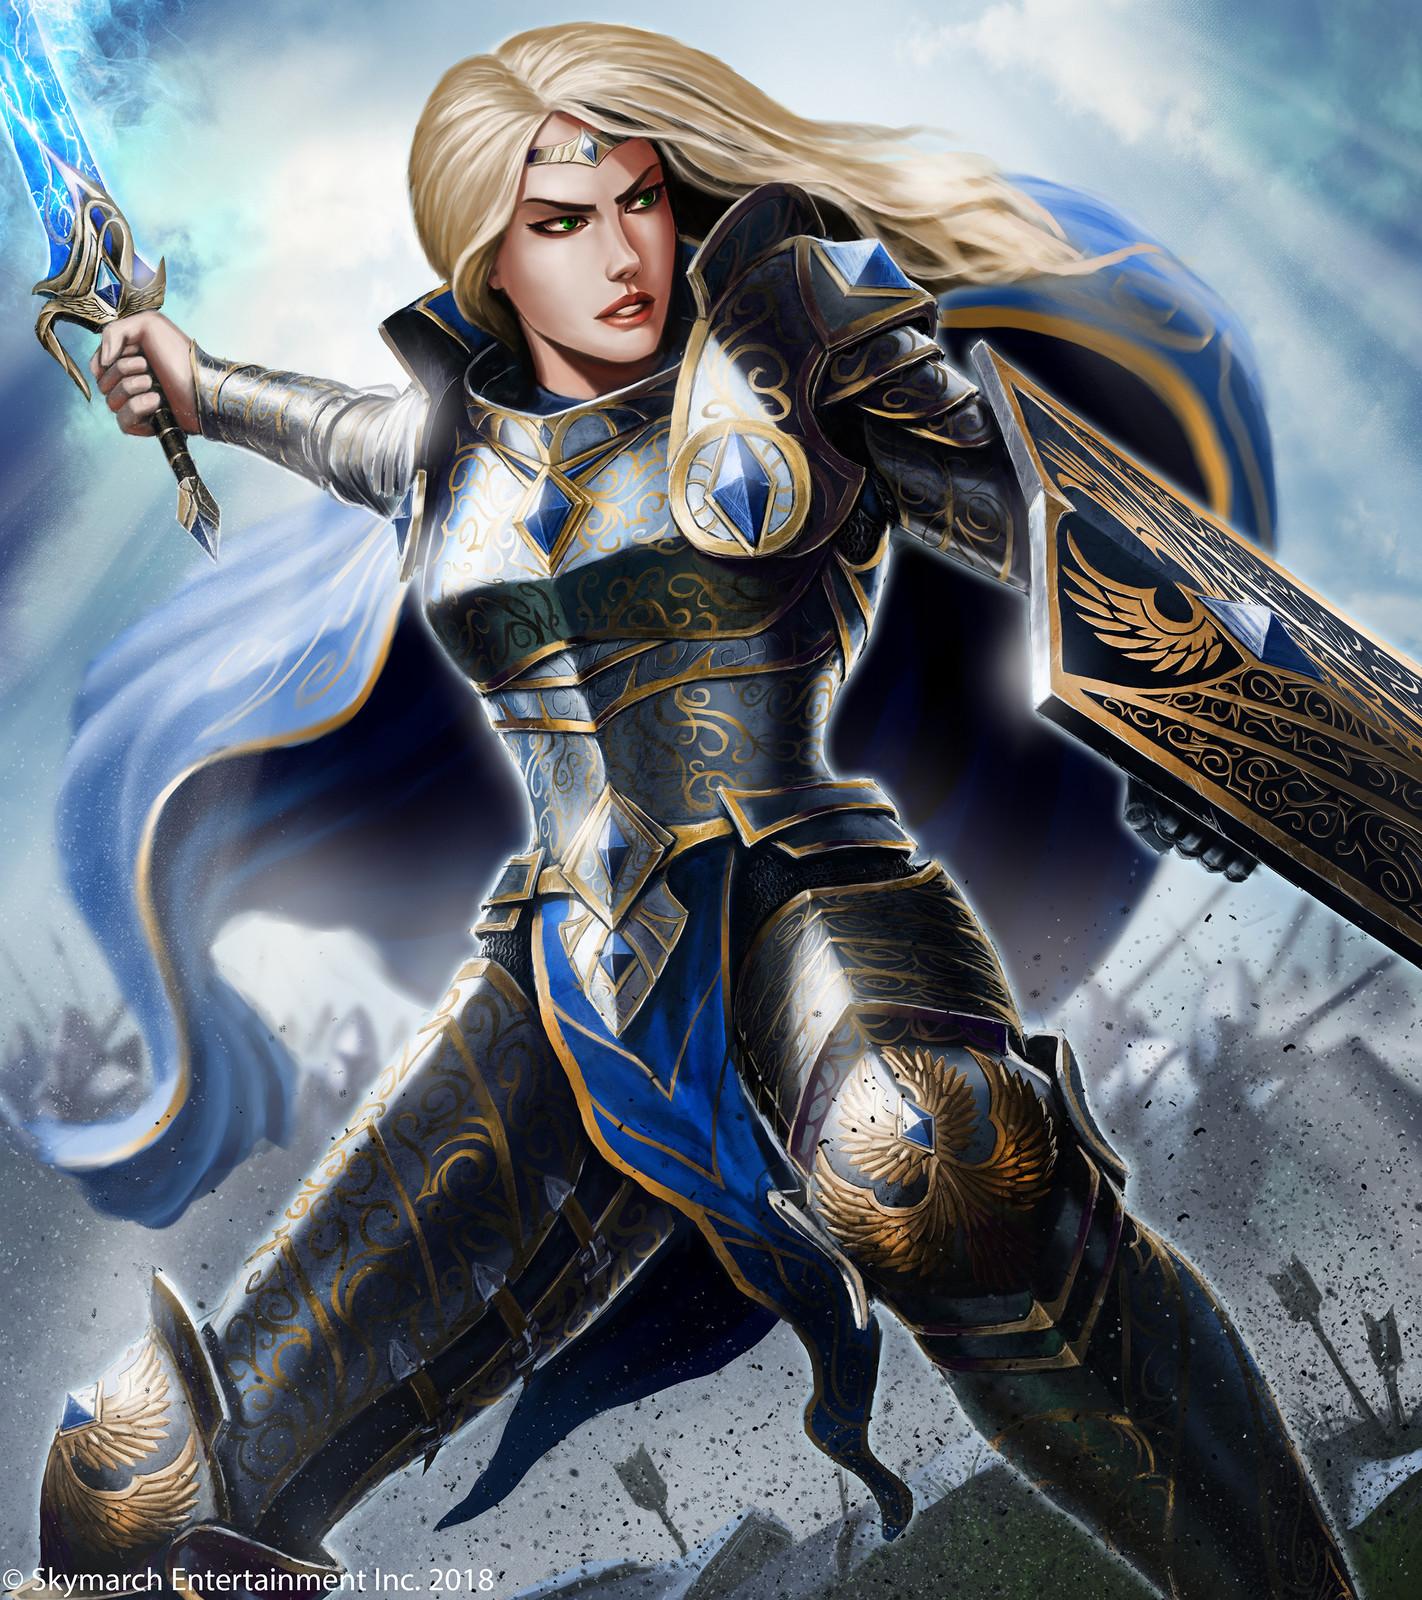 Celeste, Savior of Skymarch